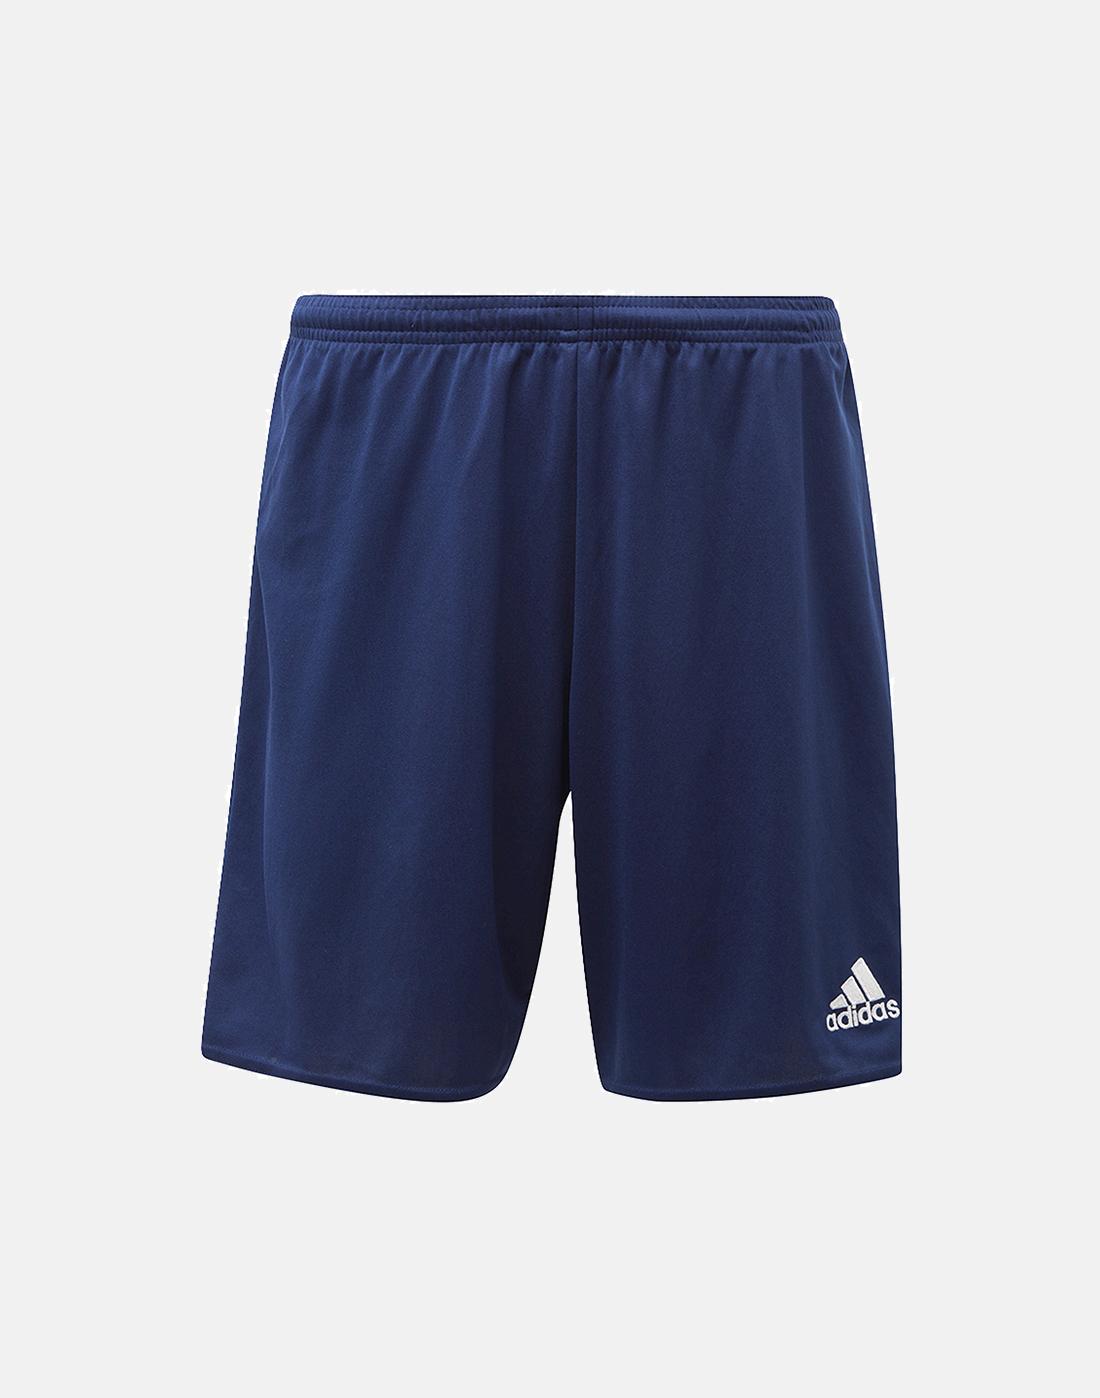 adidas parma shorts size guide